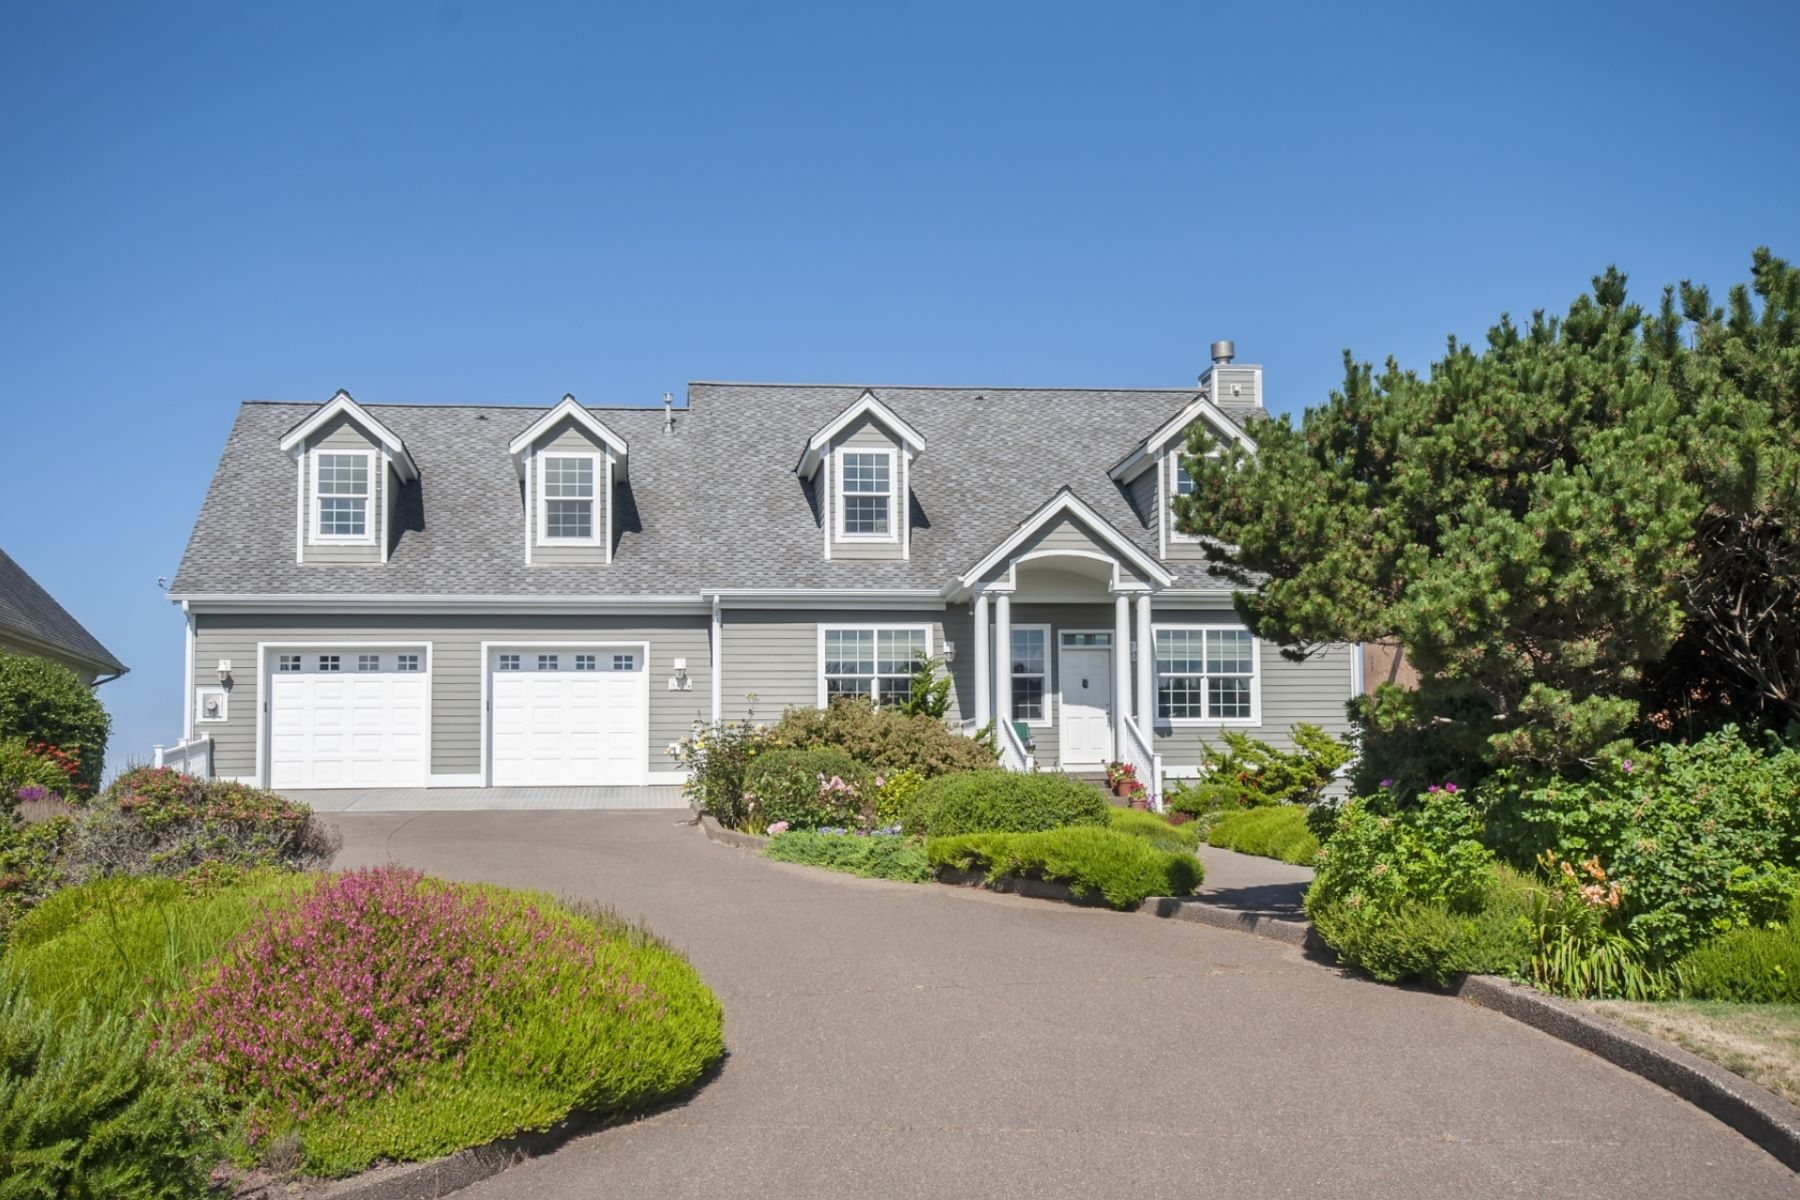 Single Family Homes για την Πώληση στο 6410 SW Arbor Dr South Beach, OR 97366 South Beach, Ορεγκον 97366 Ηνωμένες Πολιτείες